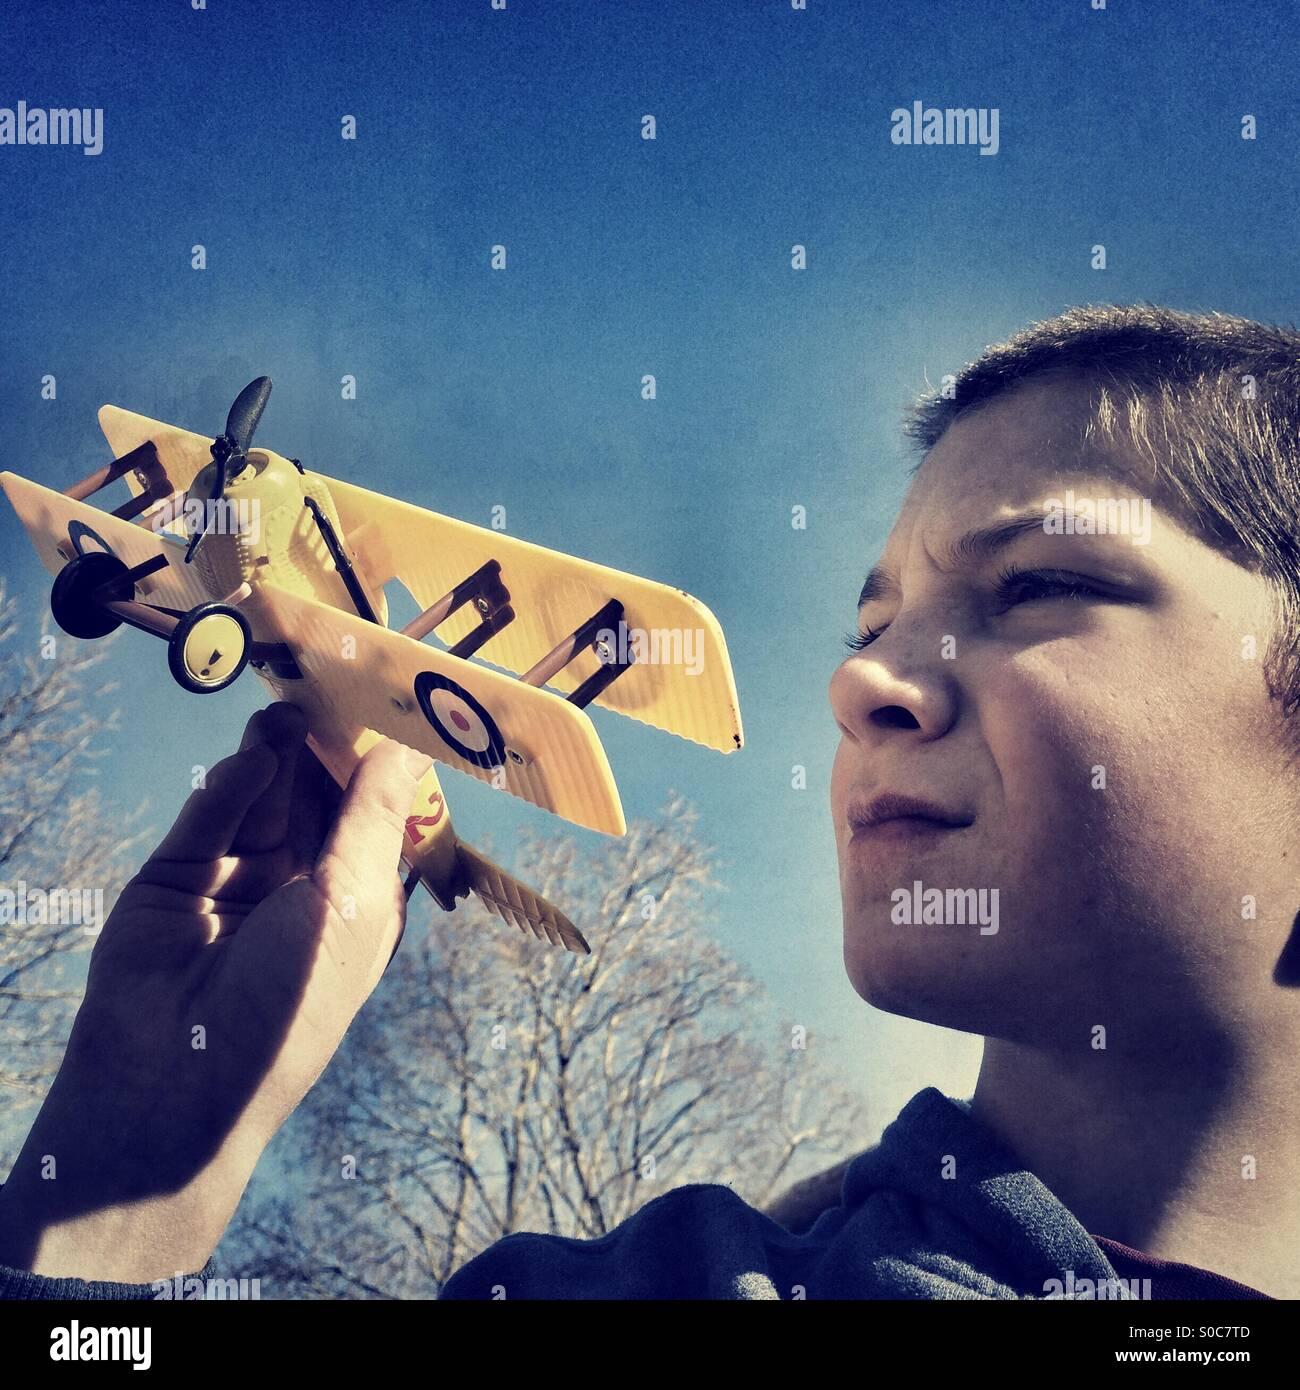 Junge seine Modell-Doppeldecker fliegen Stockbild